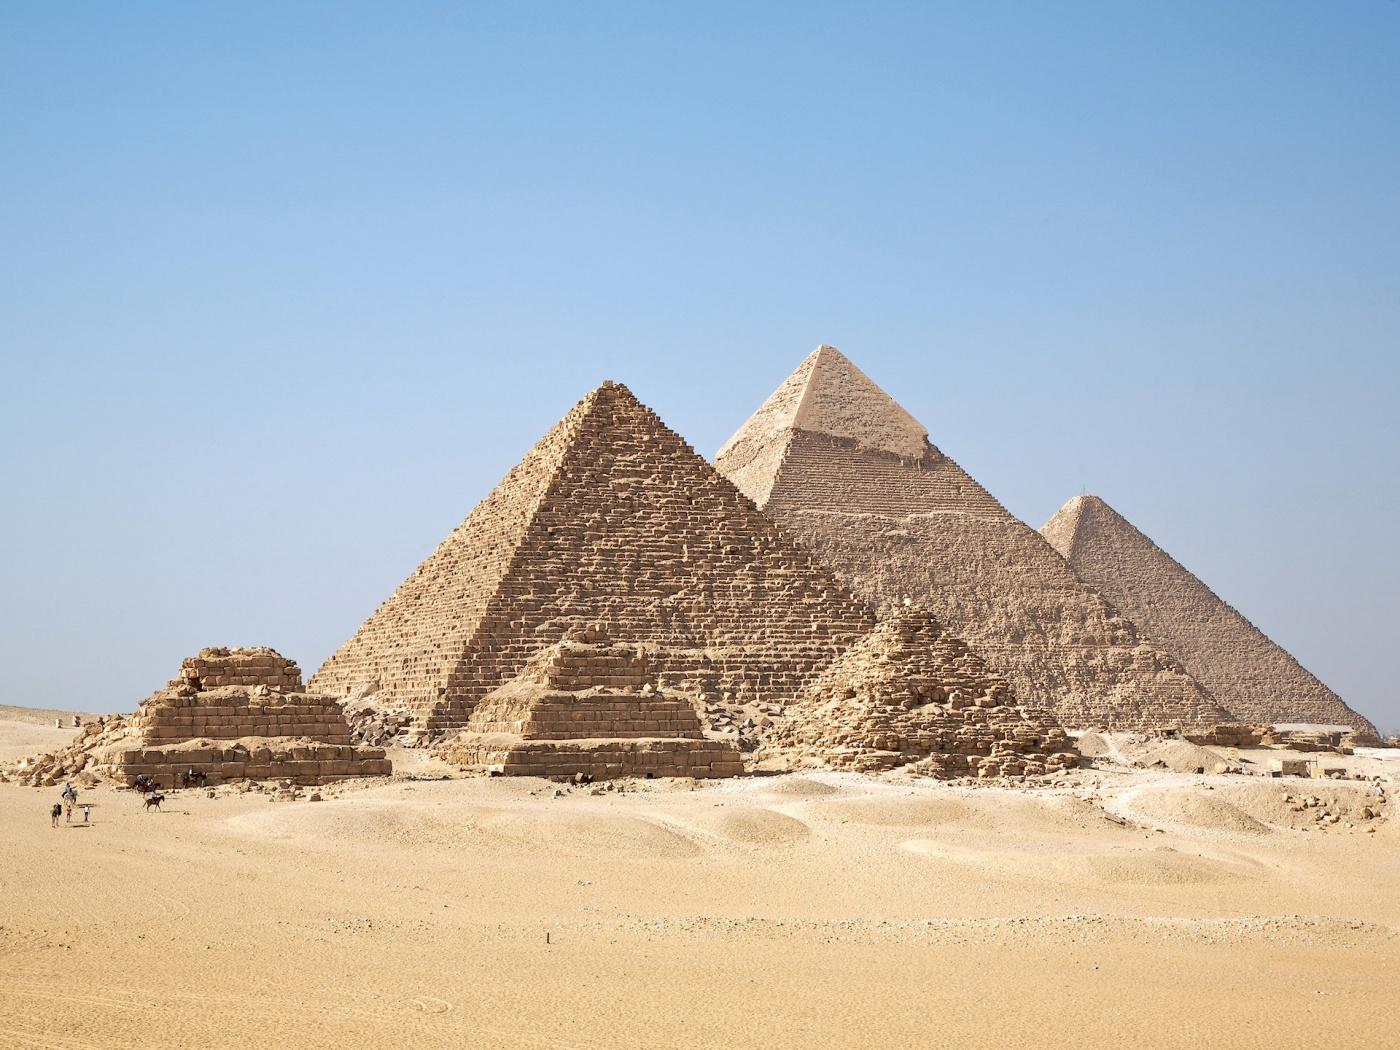 Egyptian Pyramids Wallpaper   1400x1050 1400x1050